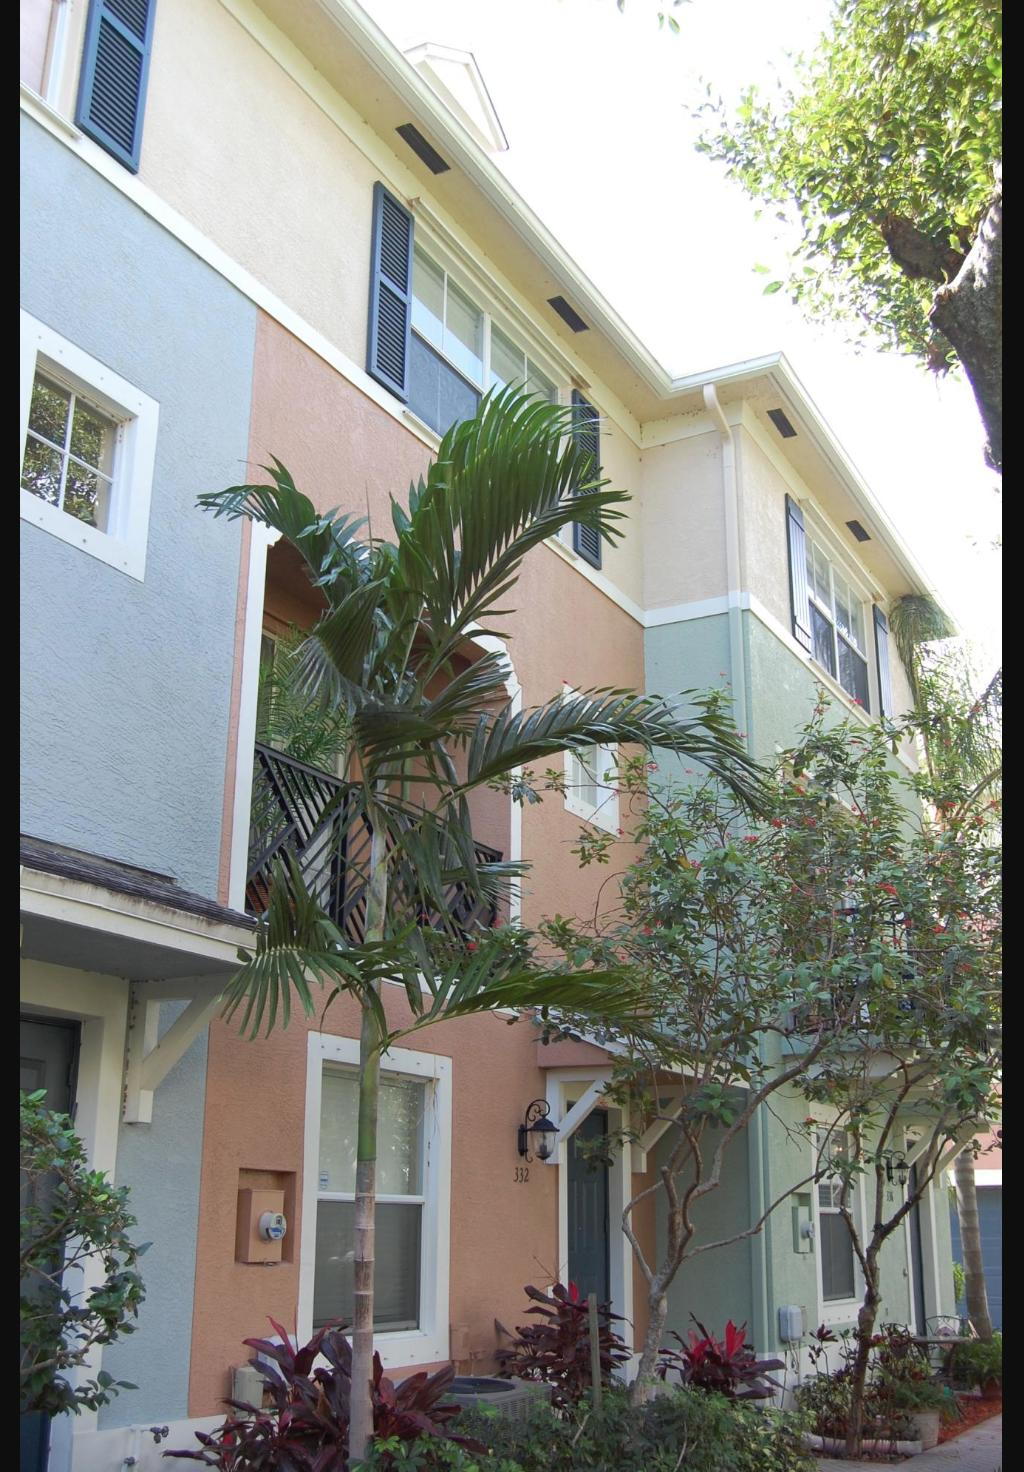 332 Atlantic Grove Way - Delray Beach, Florida